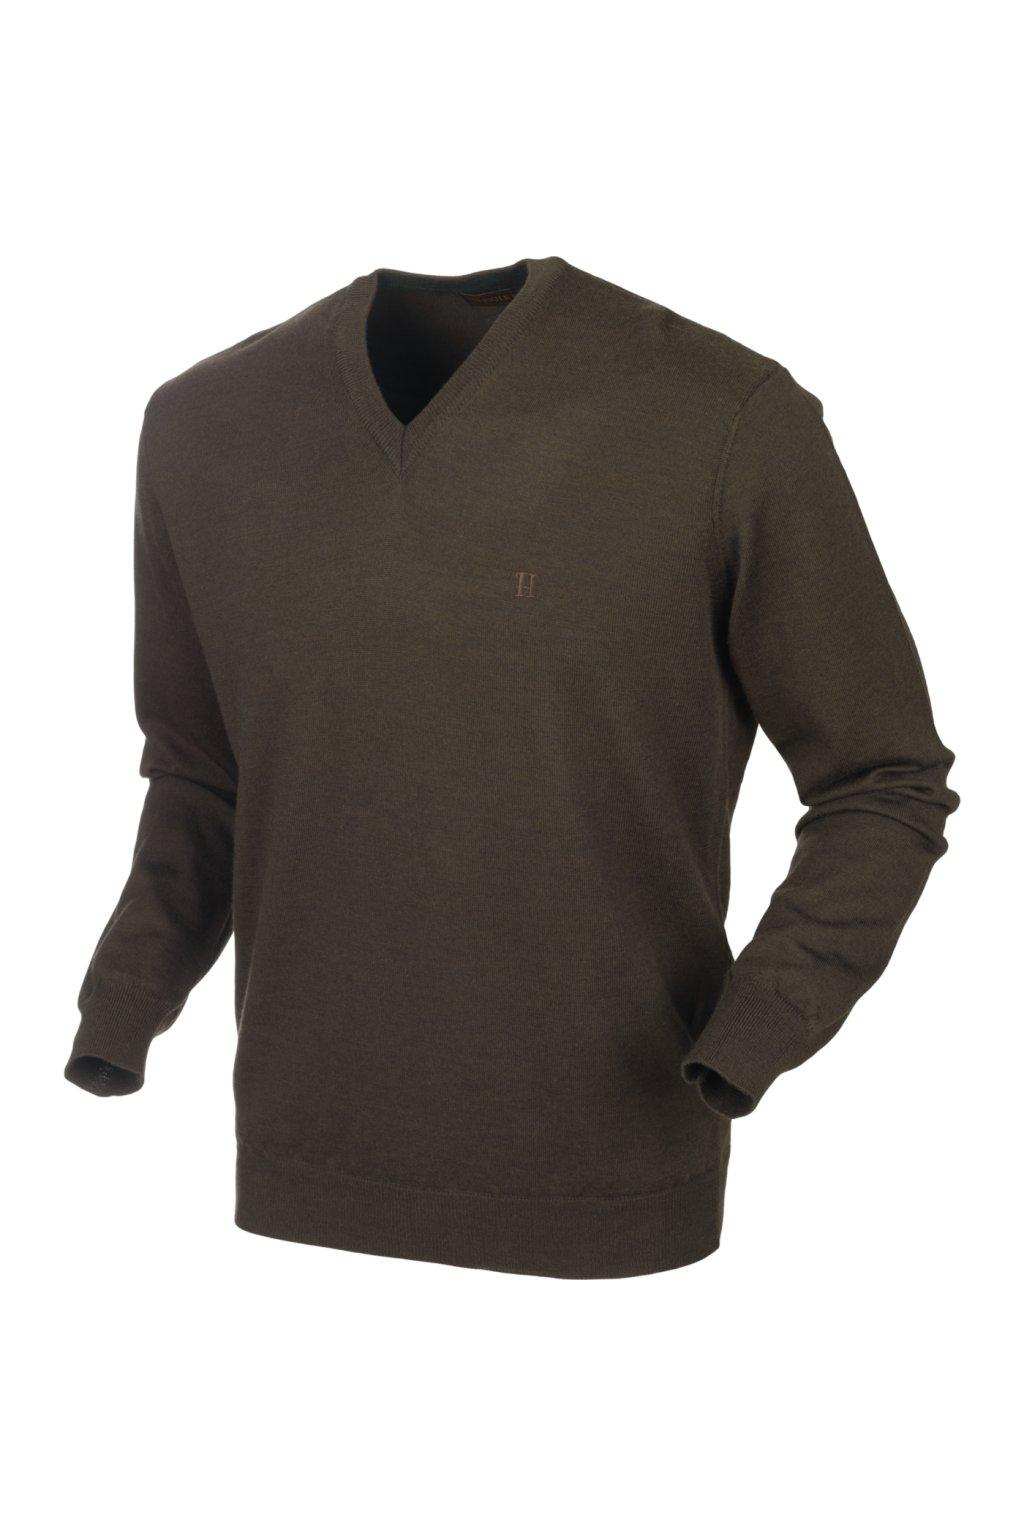 HÄRKILA  - Glenmore pullover Demitasse brown